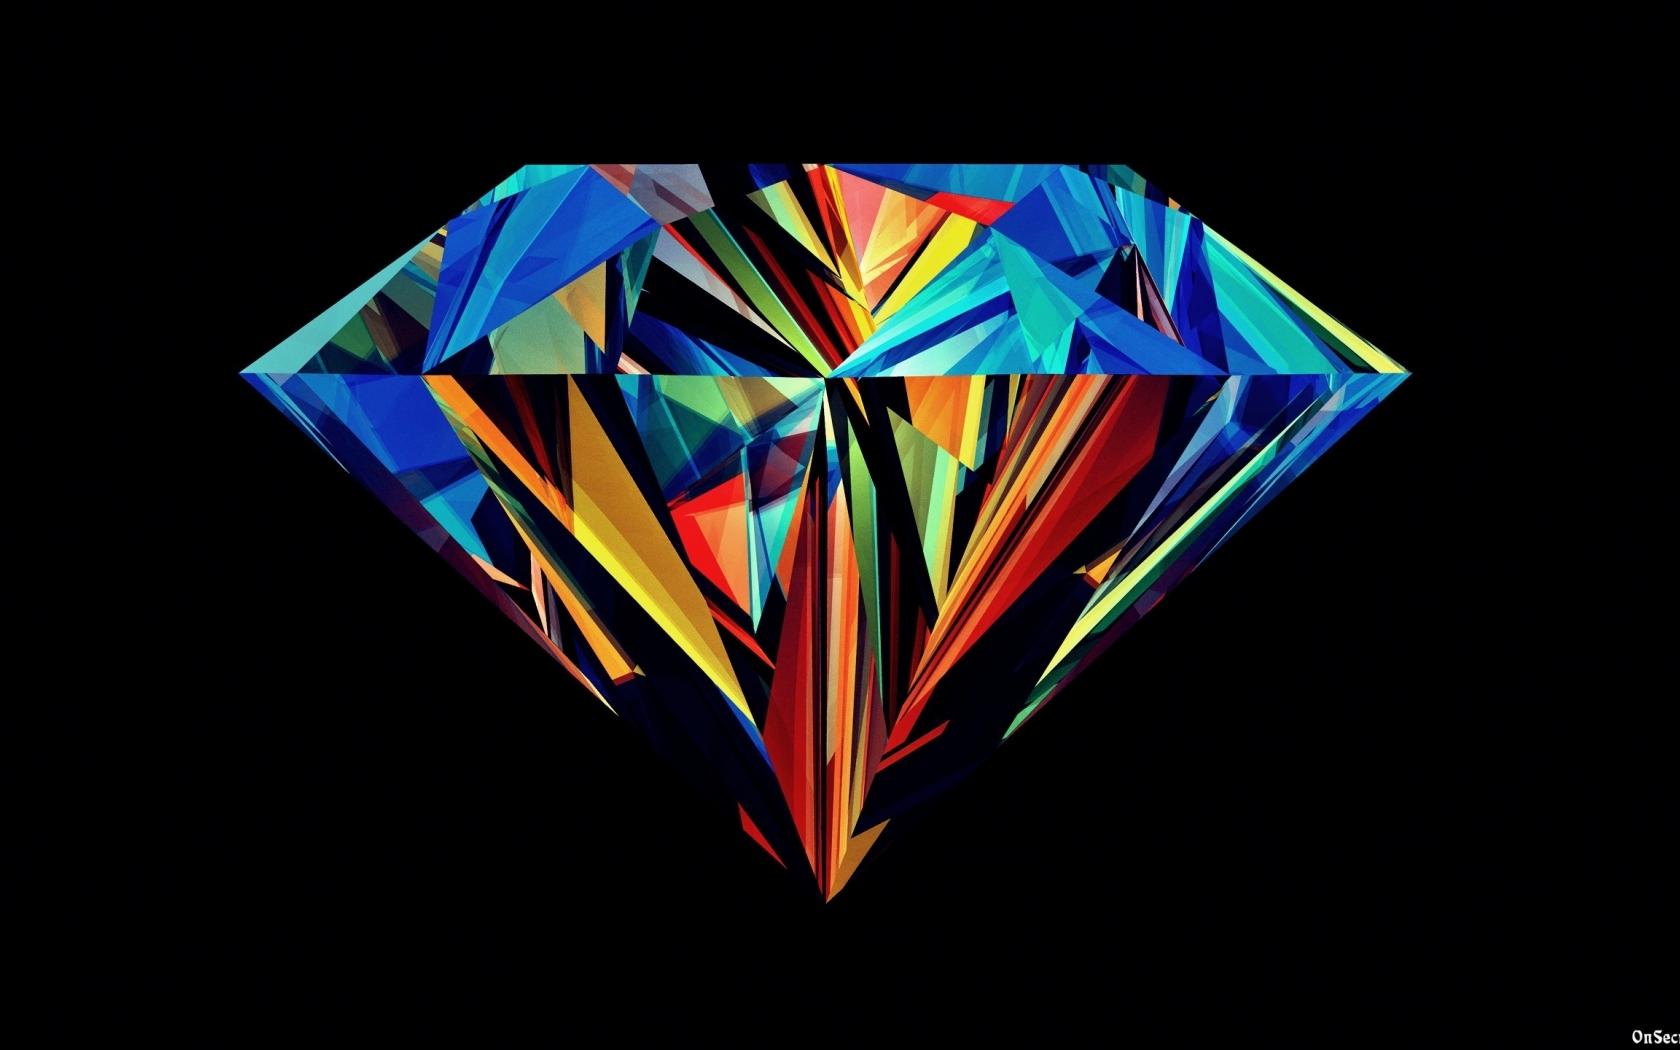 Hd Wallpapers Diamond Supply Co Logo 1024 X 768 31 Kb Jpeg HD 1680x1050